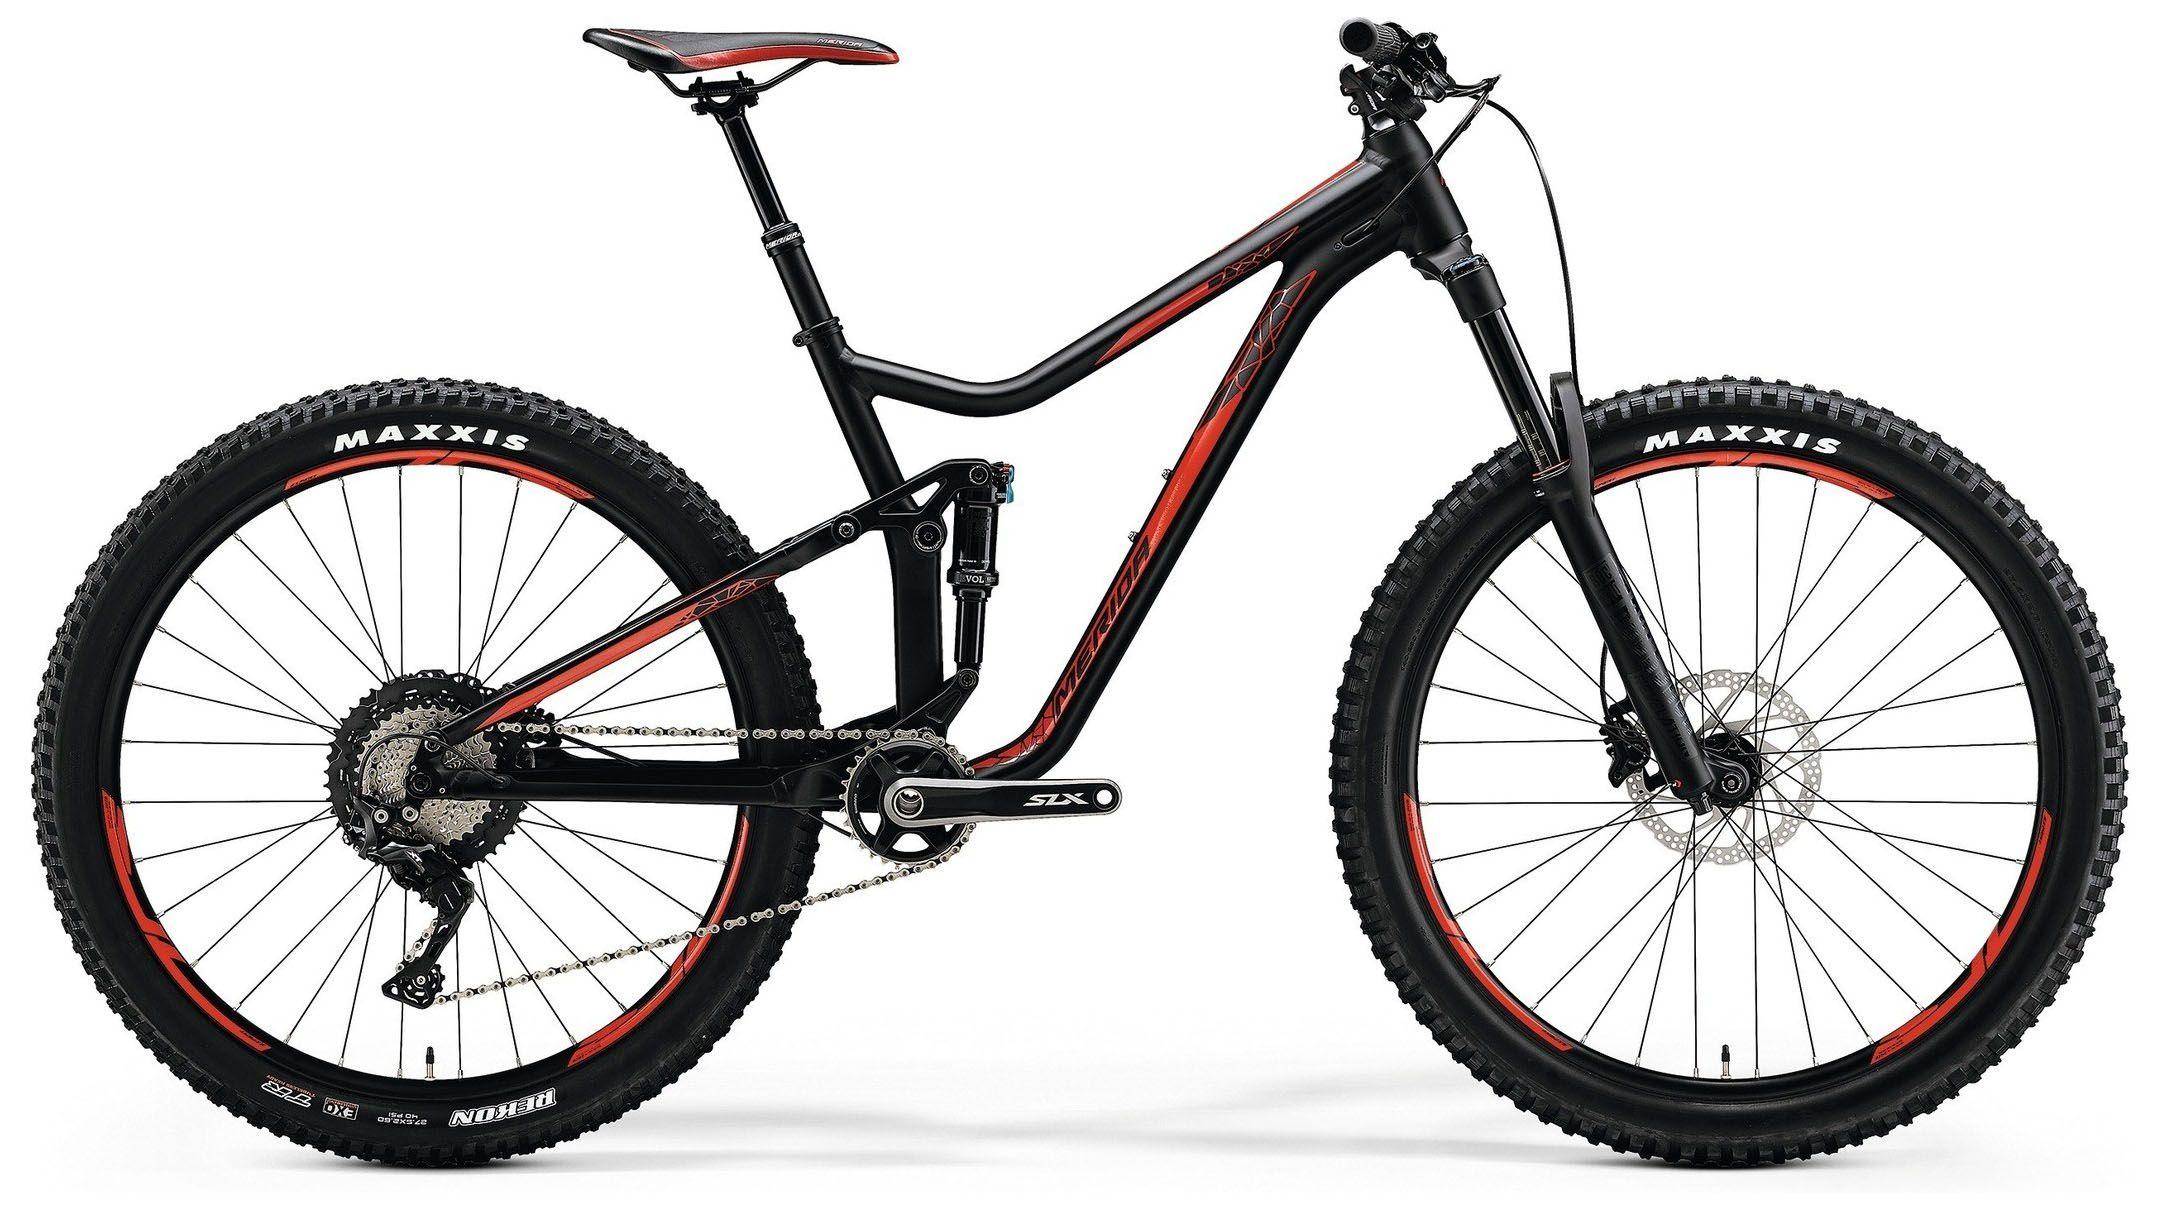 Велосипед Merida One-Forty 700 2018,  Двухподвесы  - артикул:287973